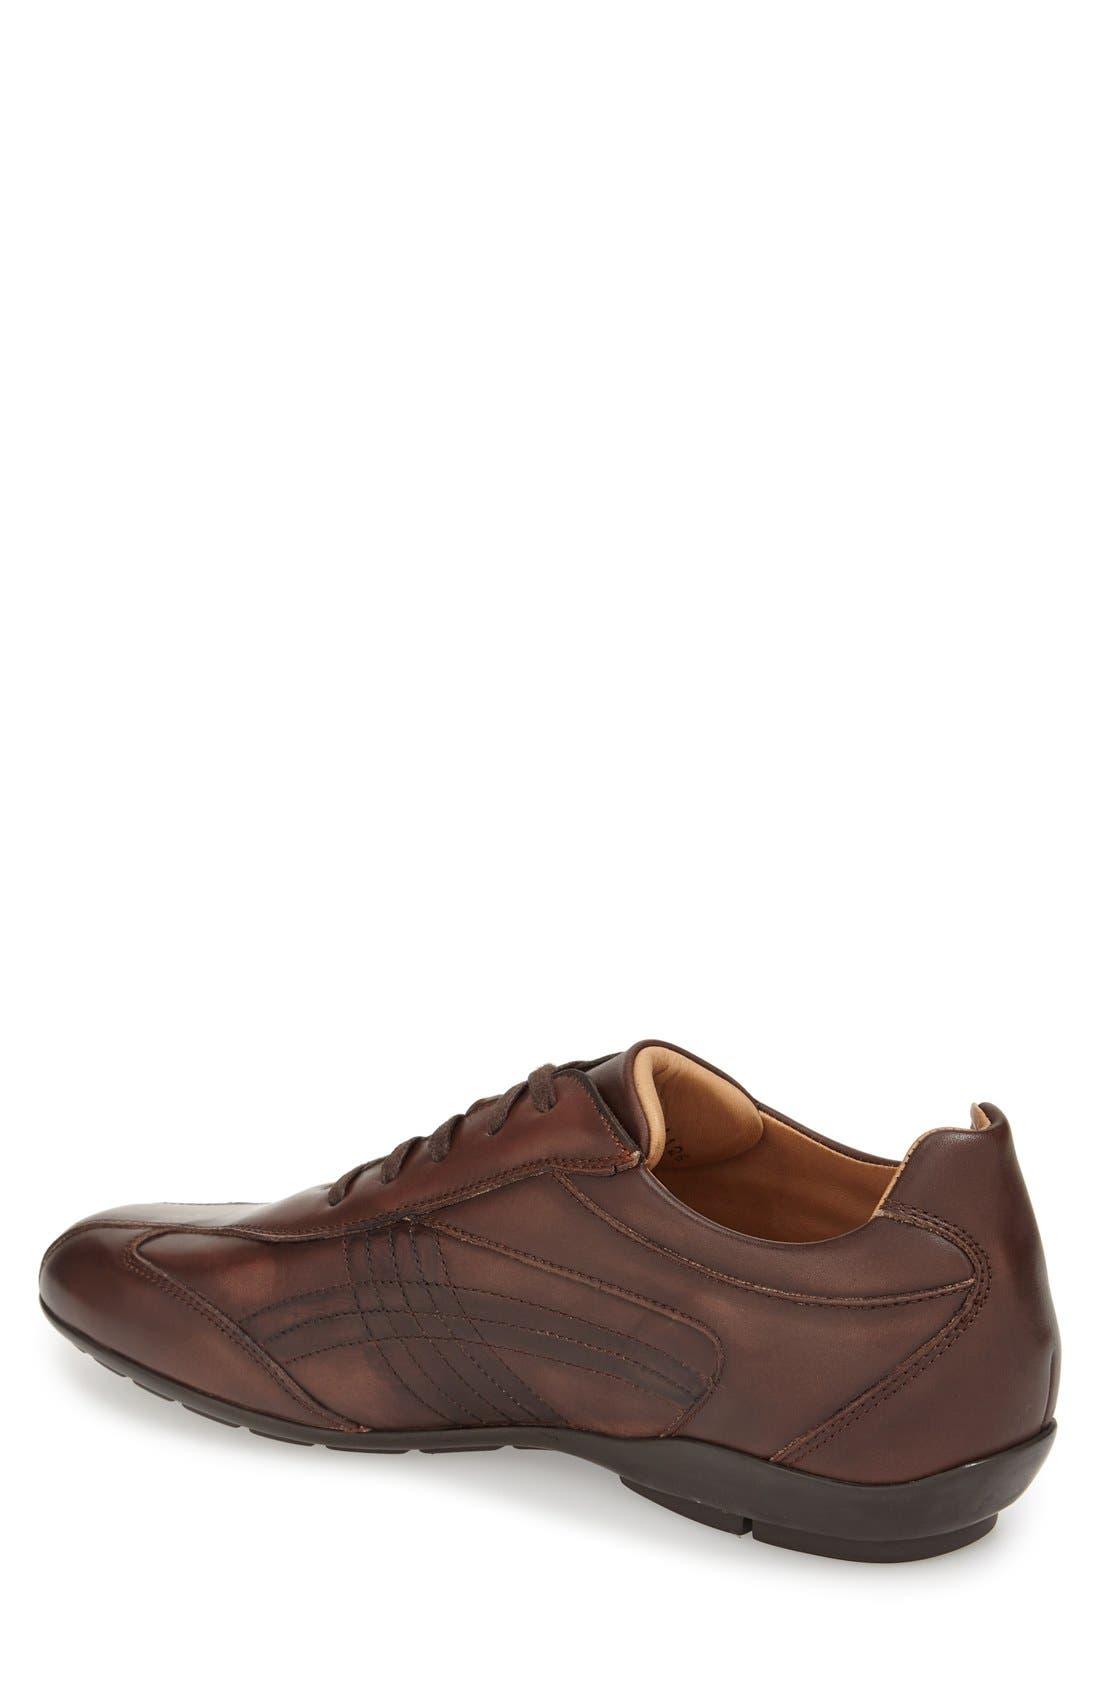 'Castelar' Lace-Up Sneaker,                             Alternate thumbnail 4, color,